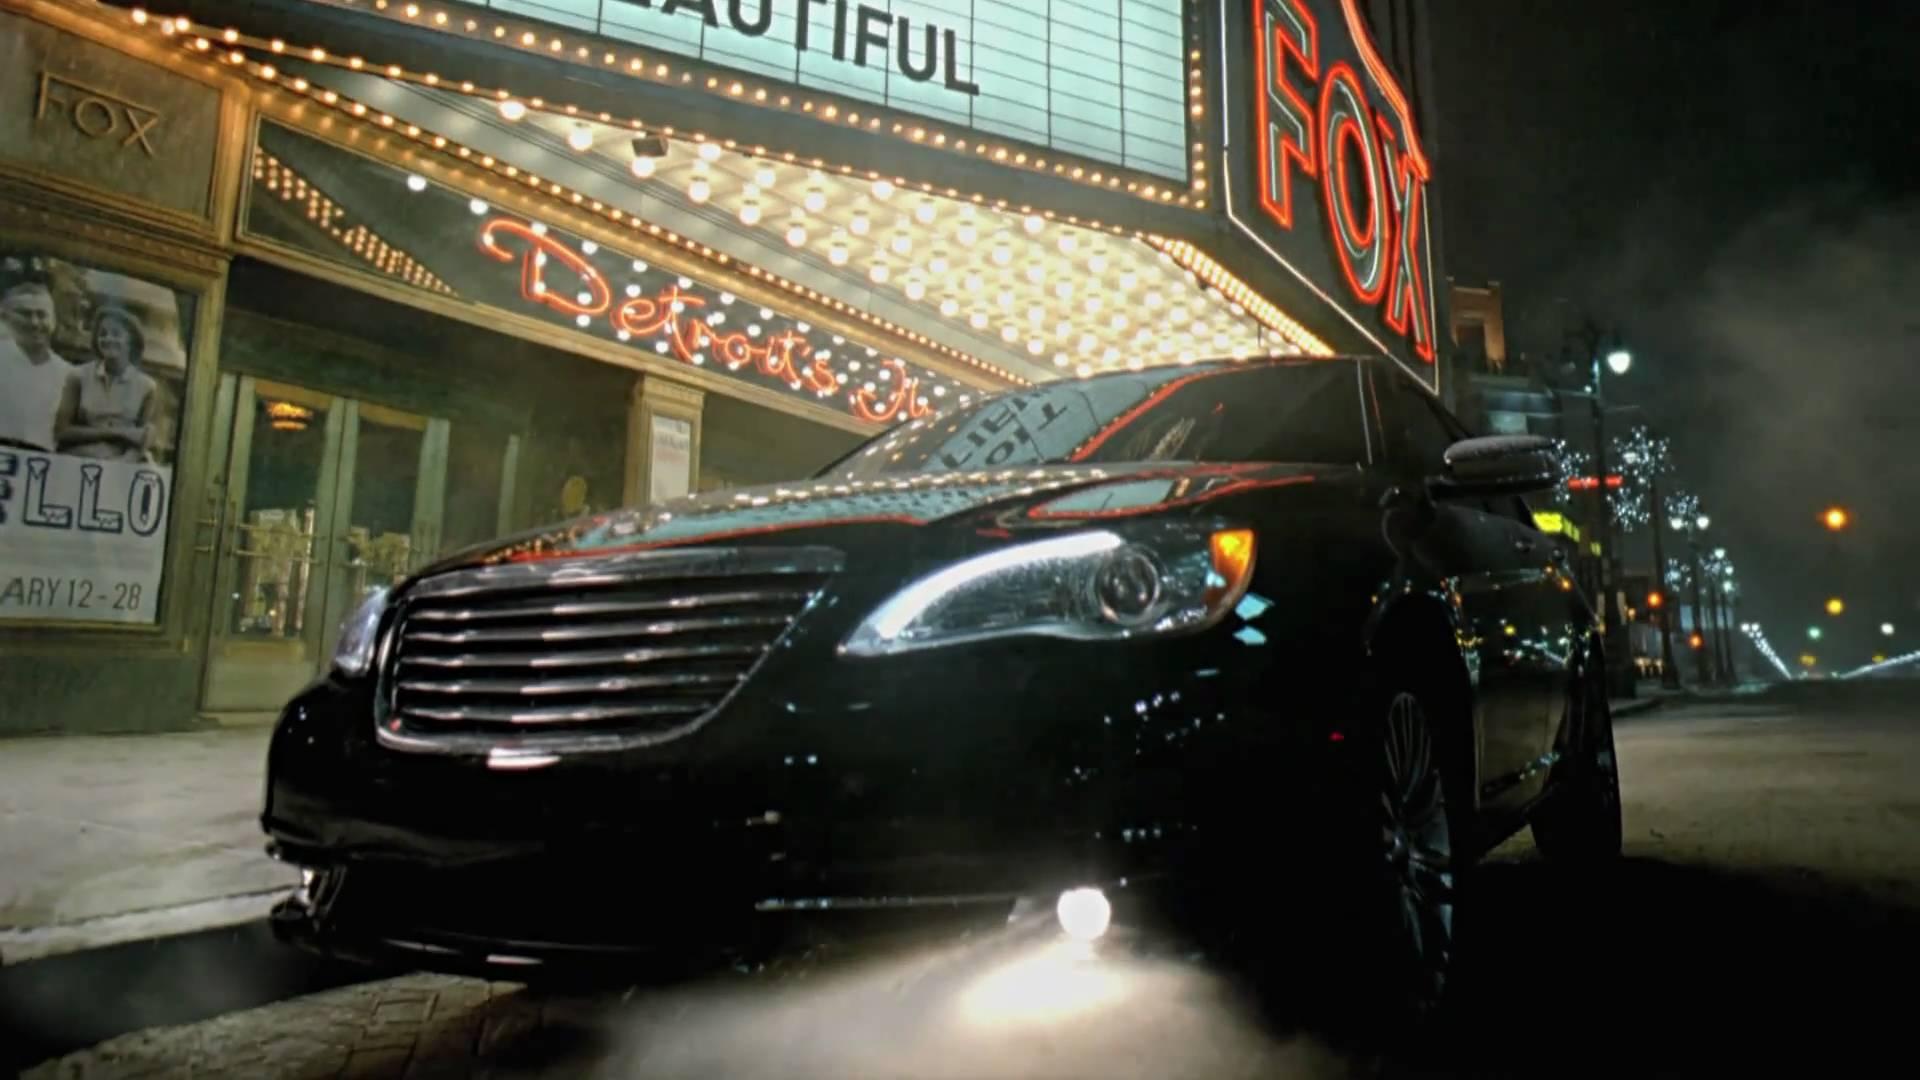 Video: Chrysler Creates a Common Enemy